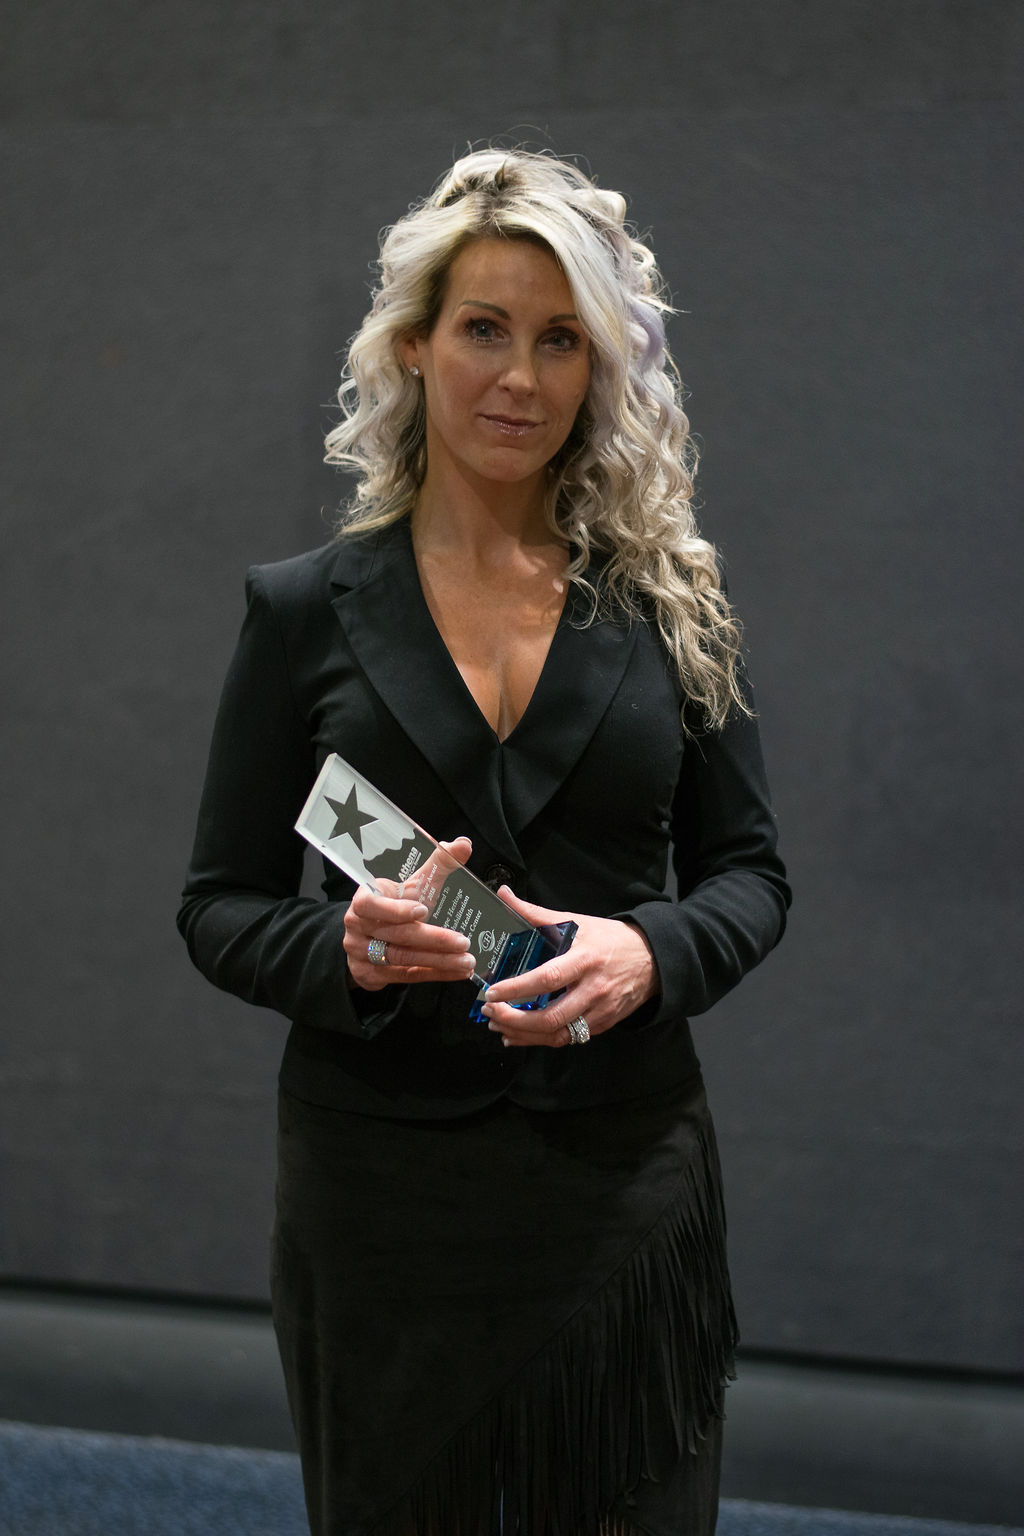 Athena Hosts Holiday Awards & Recognition Party - Athena ...